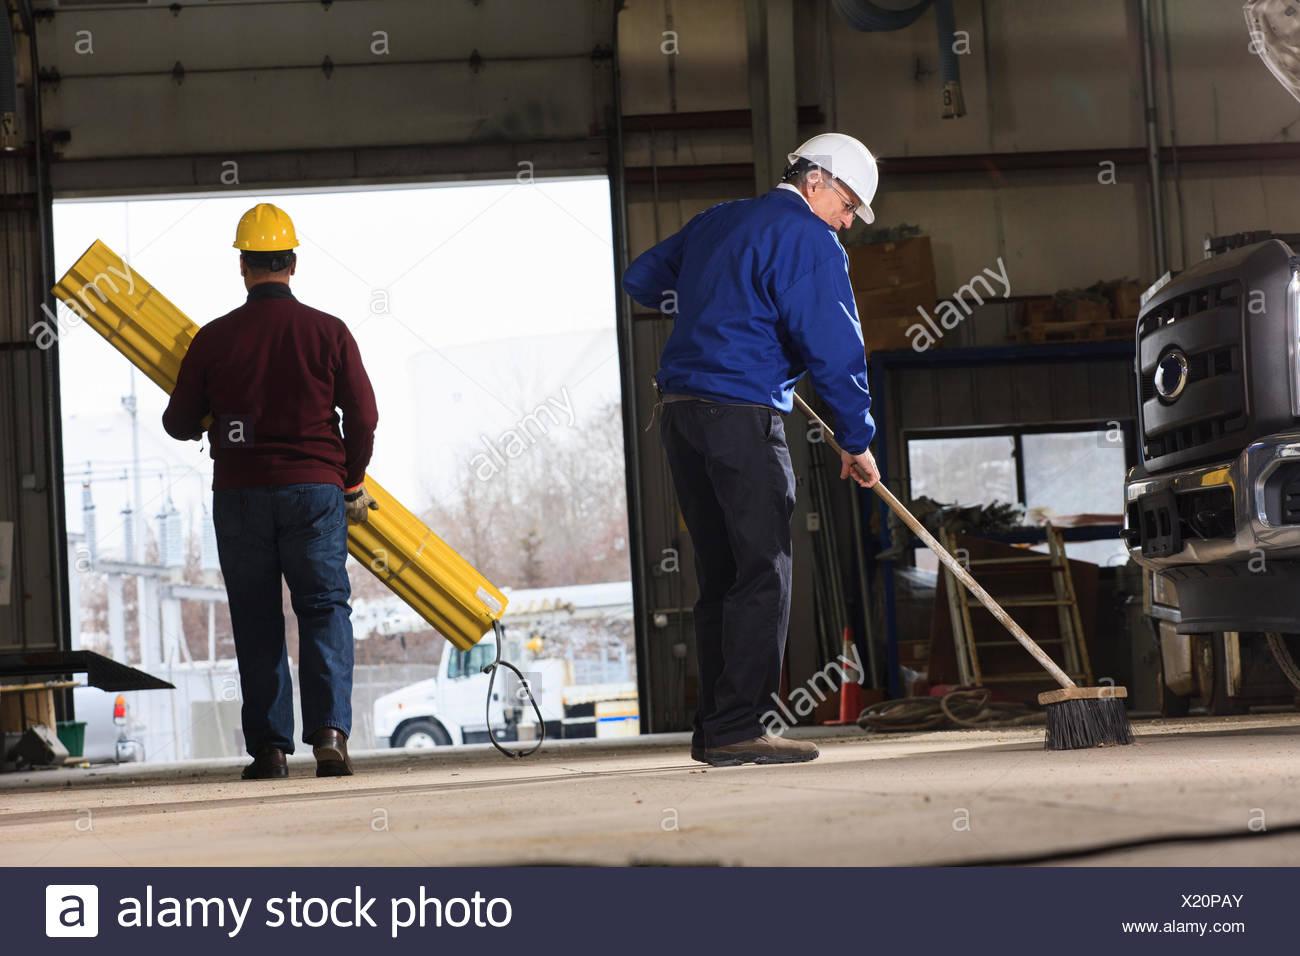 Man Carrying Broom Stockfotos & Man Carrying Broom Bilder - Alamy